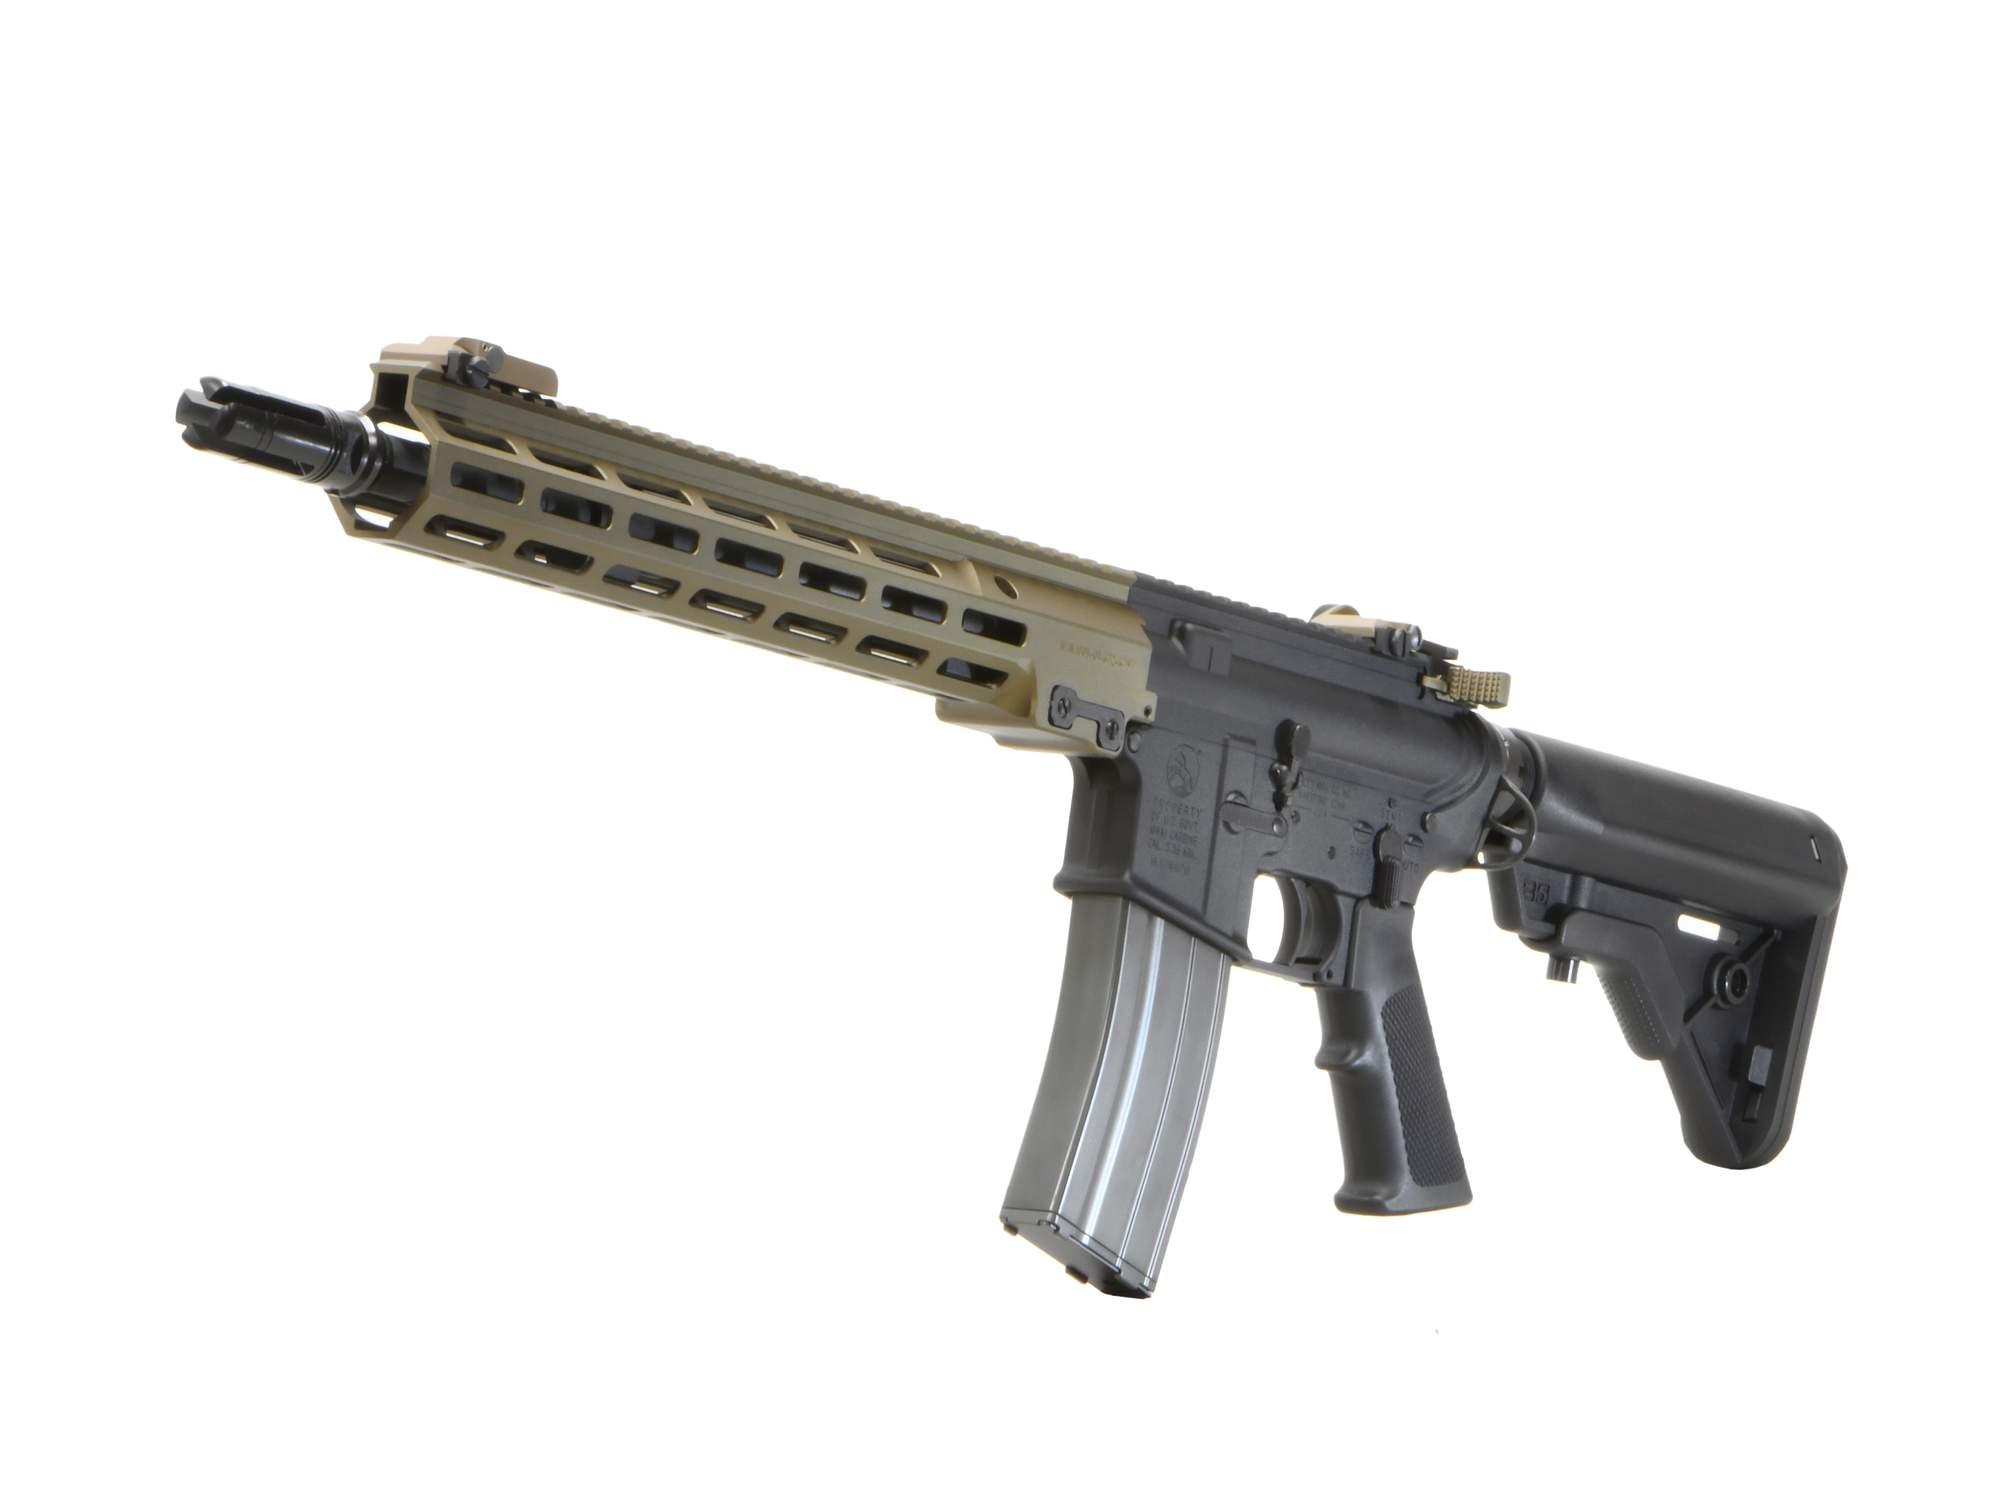 CyberGun Colt URG-I 14.5in GBBR V2 (JPver.) [ガスガン]